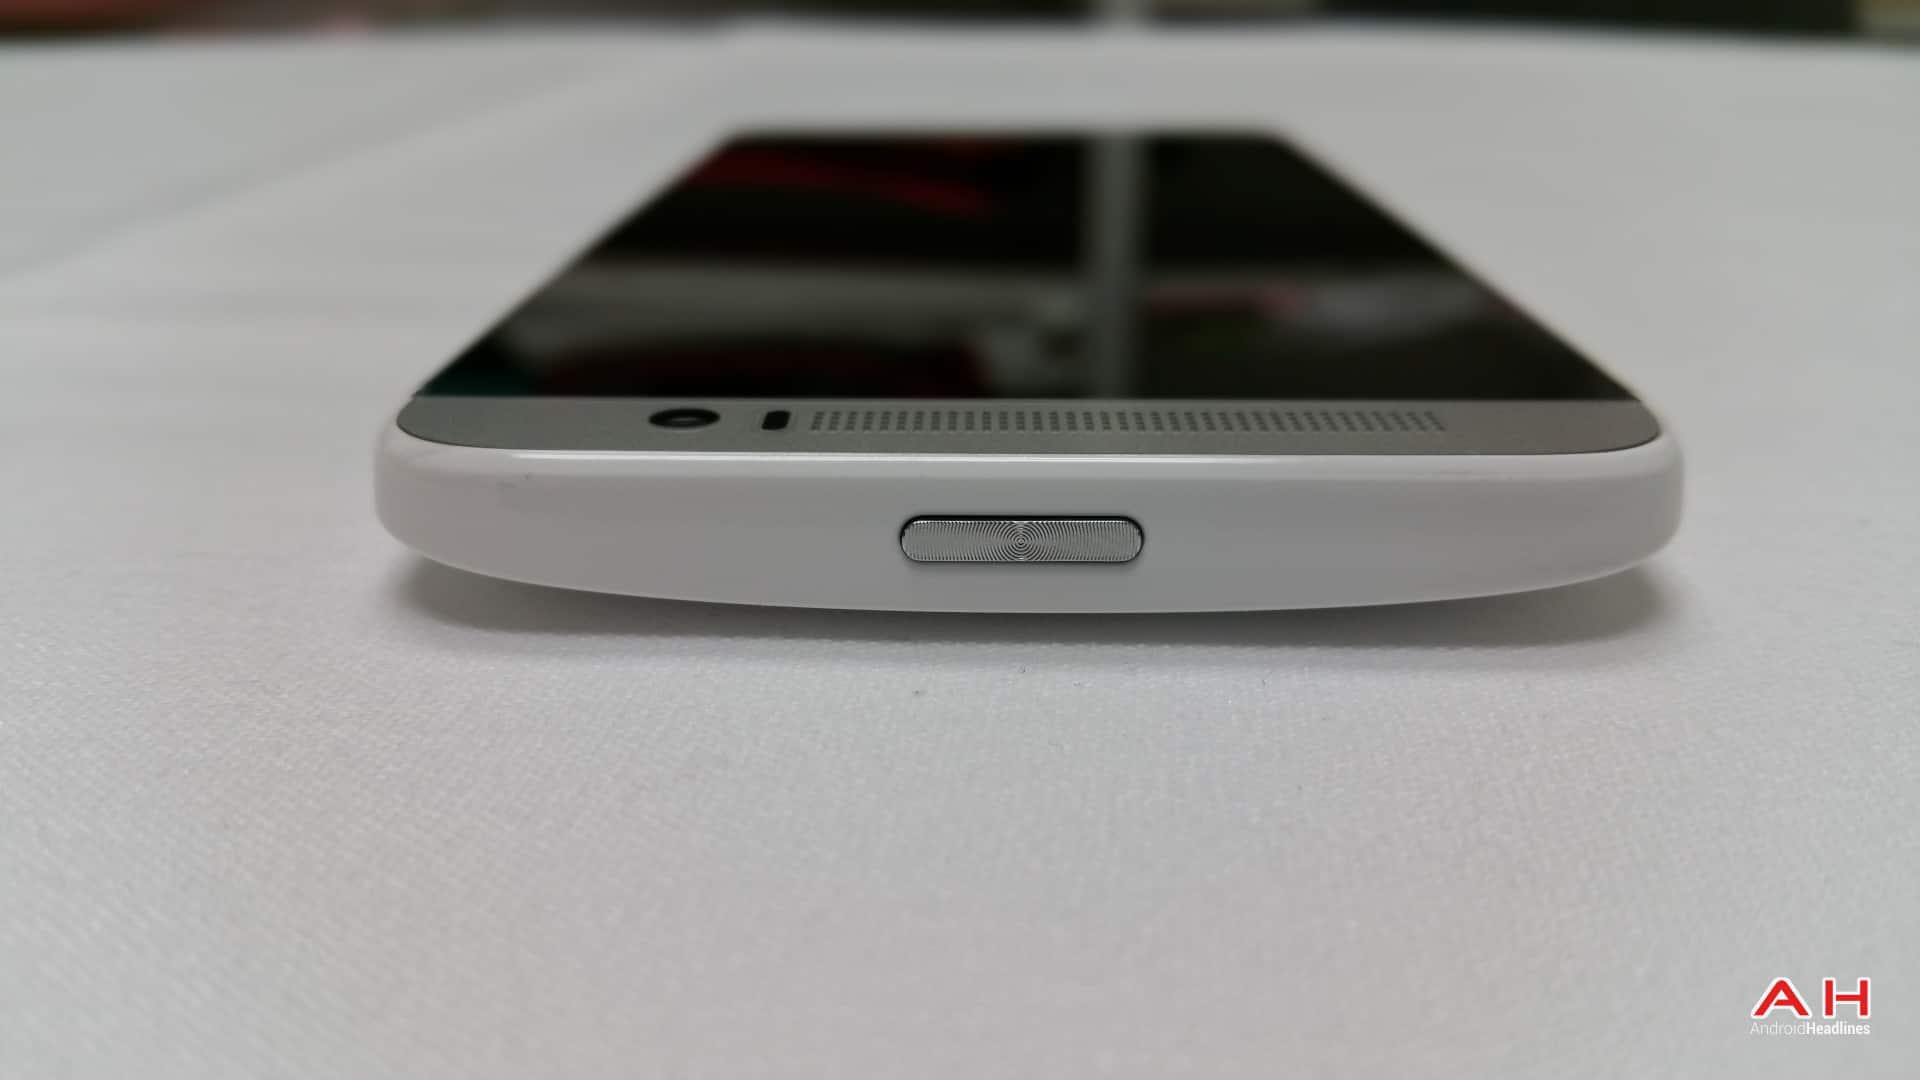 AH HTC One E8 8